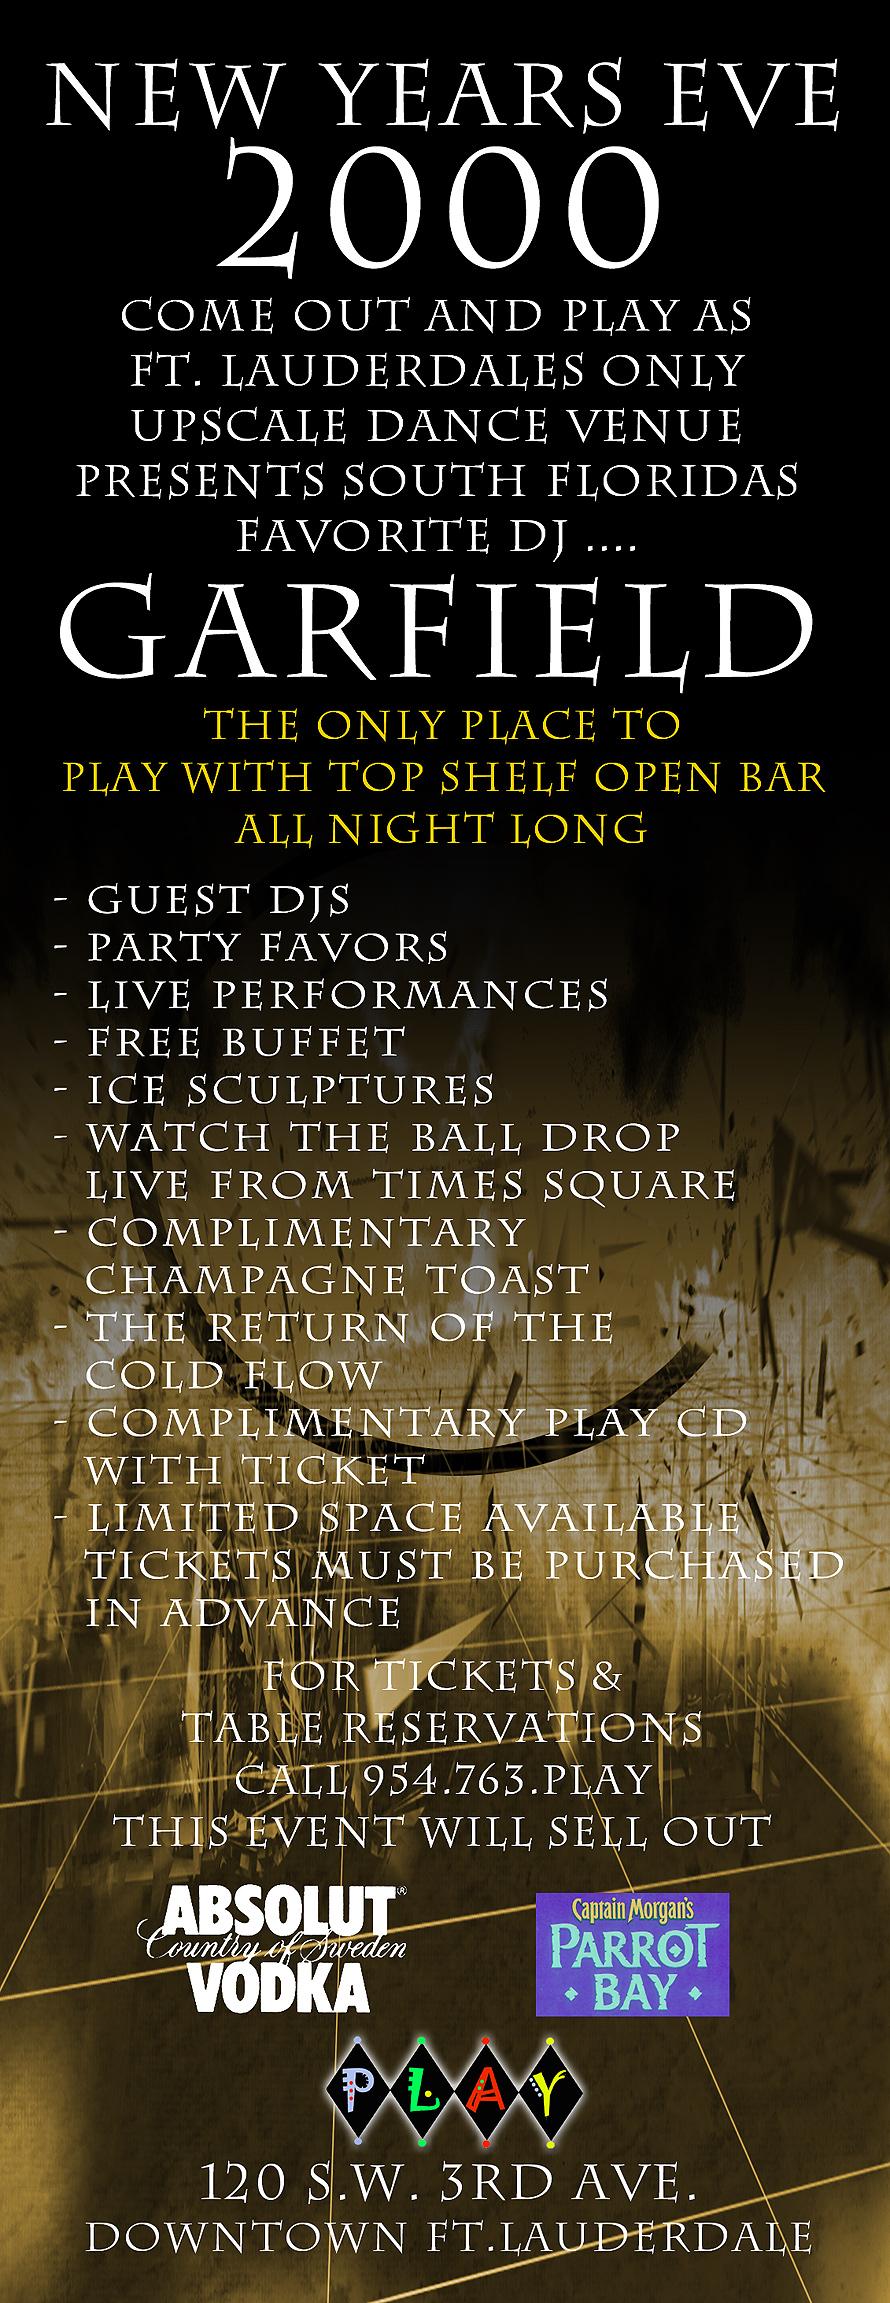 New Years Eve at Play Nightclub